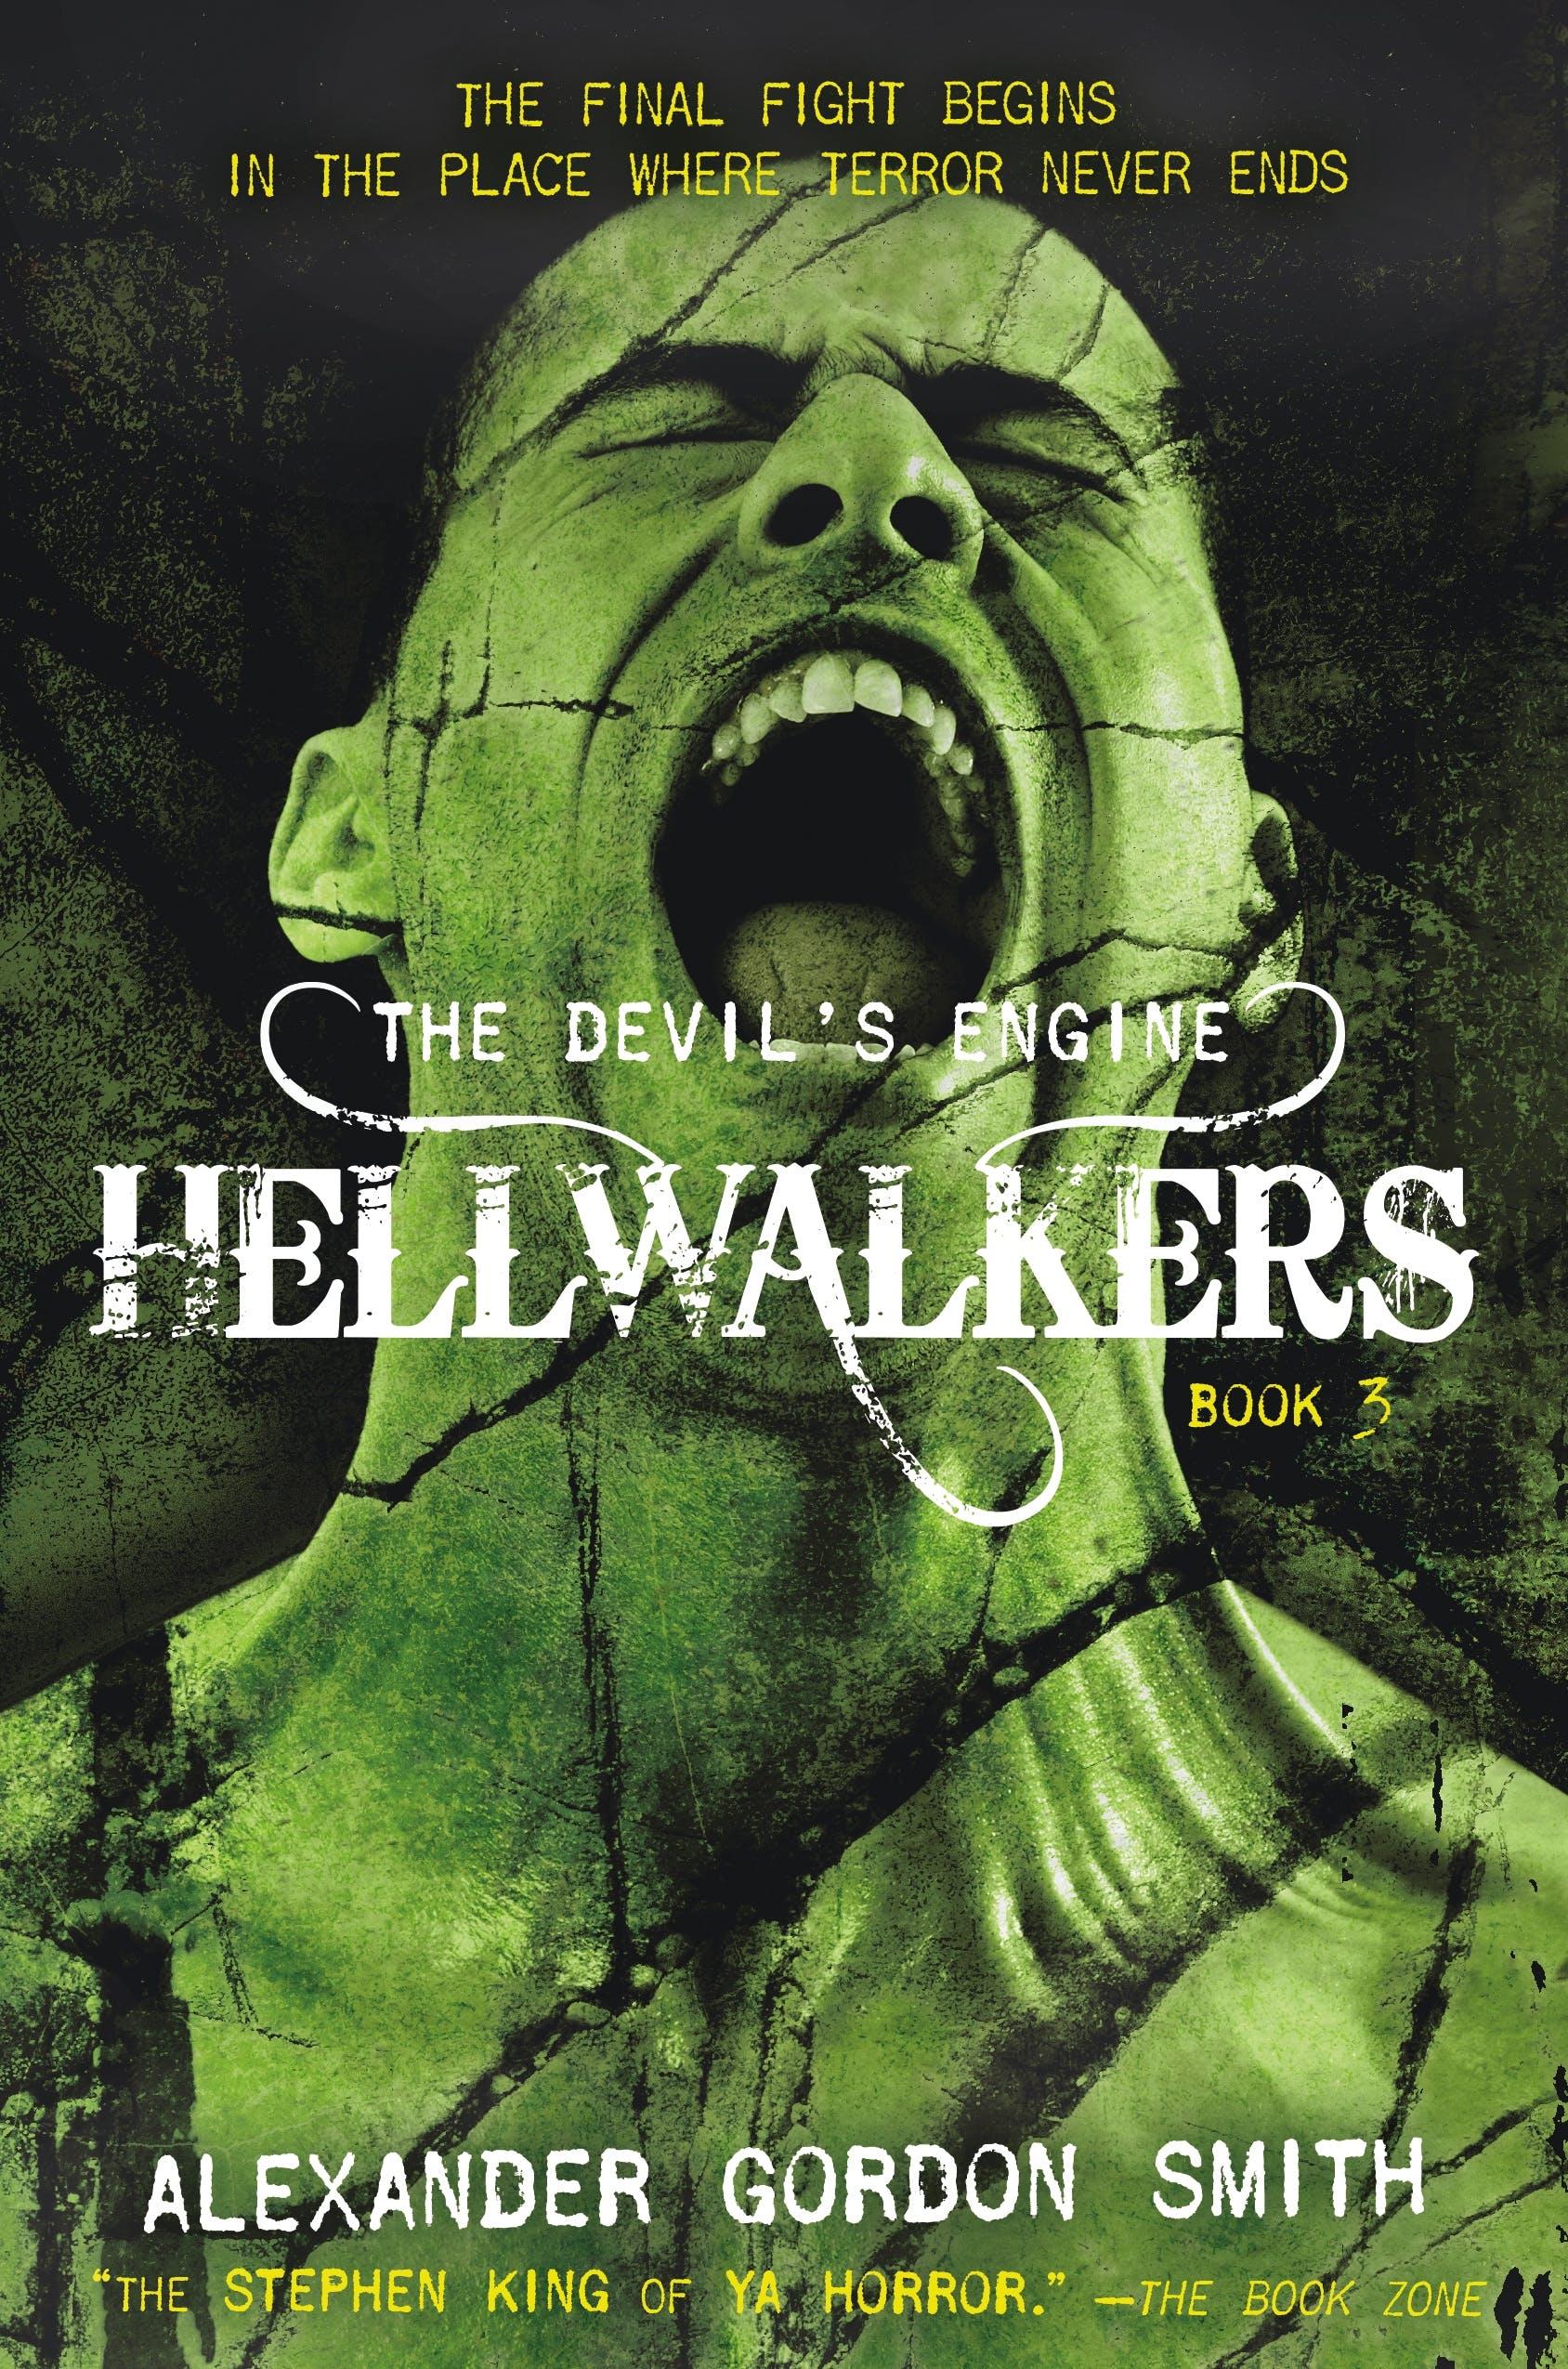 Image of The Devil's Engine: Hellwalkers